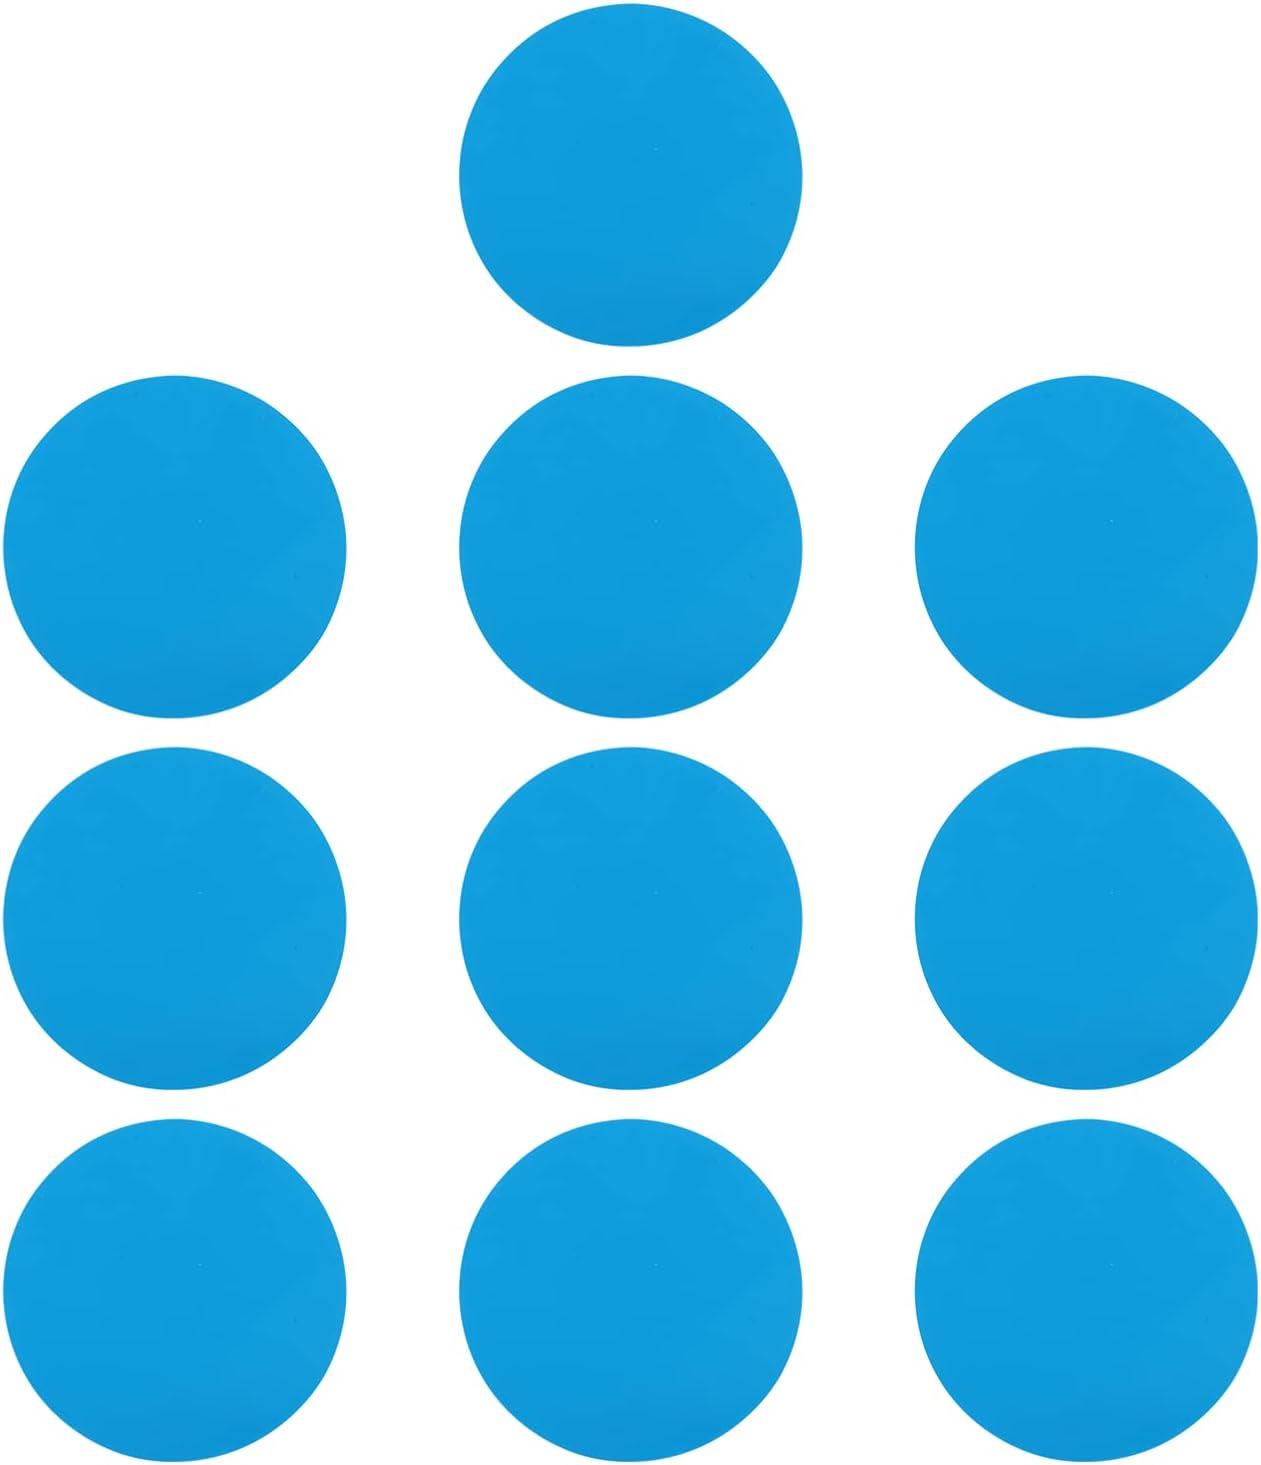 YARNOW 10 Piezas de PVC Autoadhesivo Parche de Reparación de Vinilo para Piscina Kit de Reparación de Parches de Plástico para Piscinas Inflables Productos de Barcos Balsa Kayak Canoa